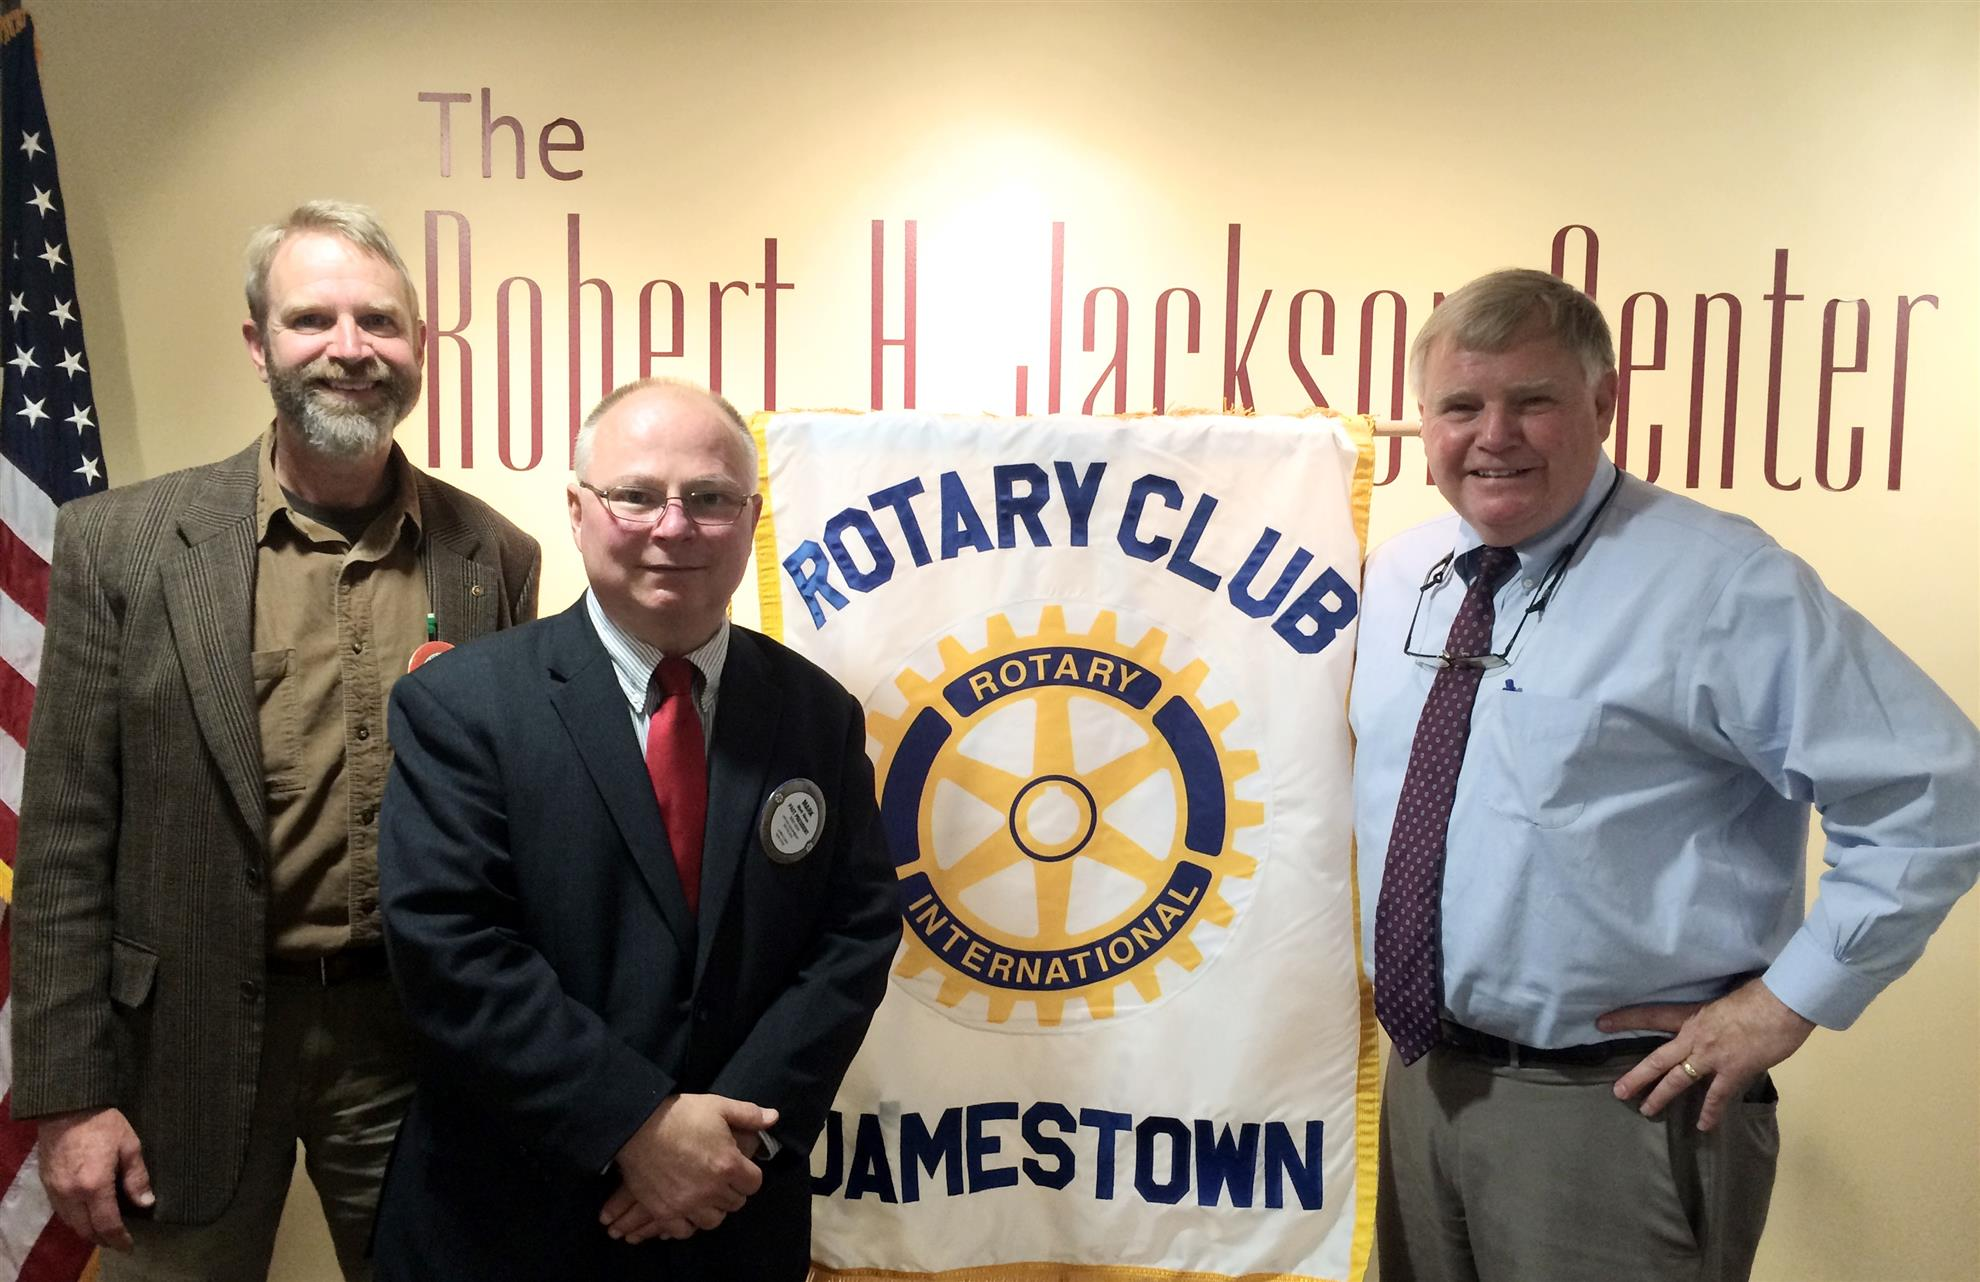 Stories Rotary Club Of Jamestown New York